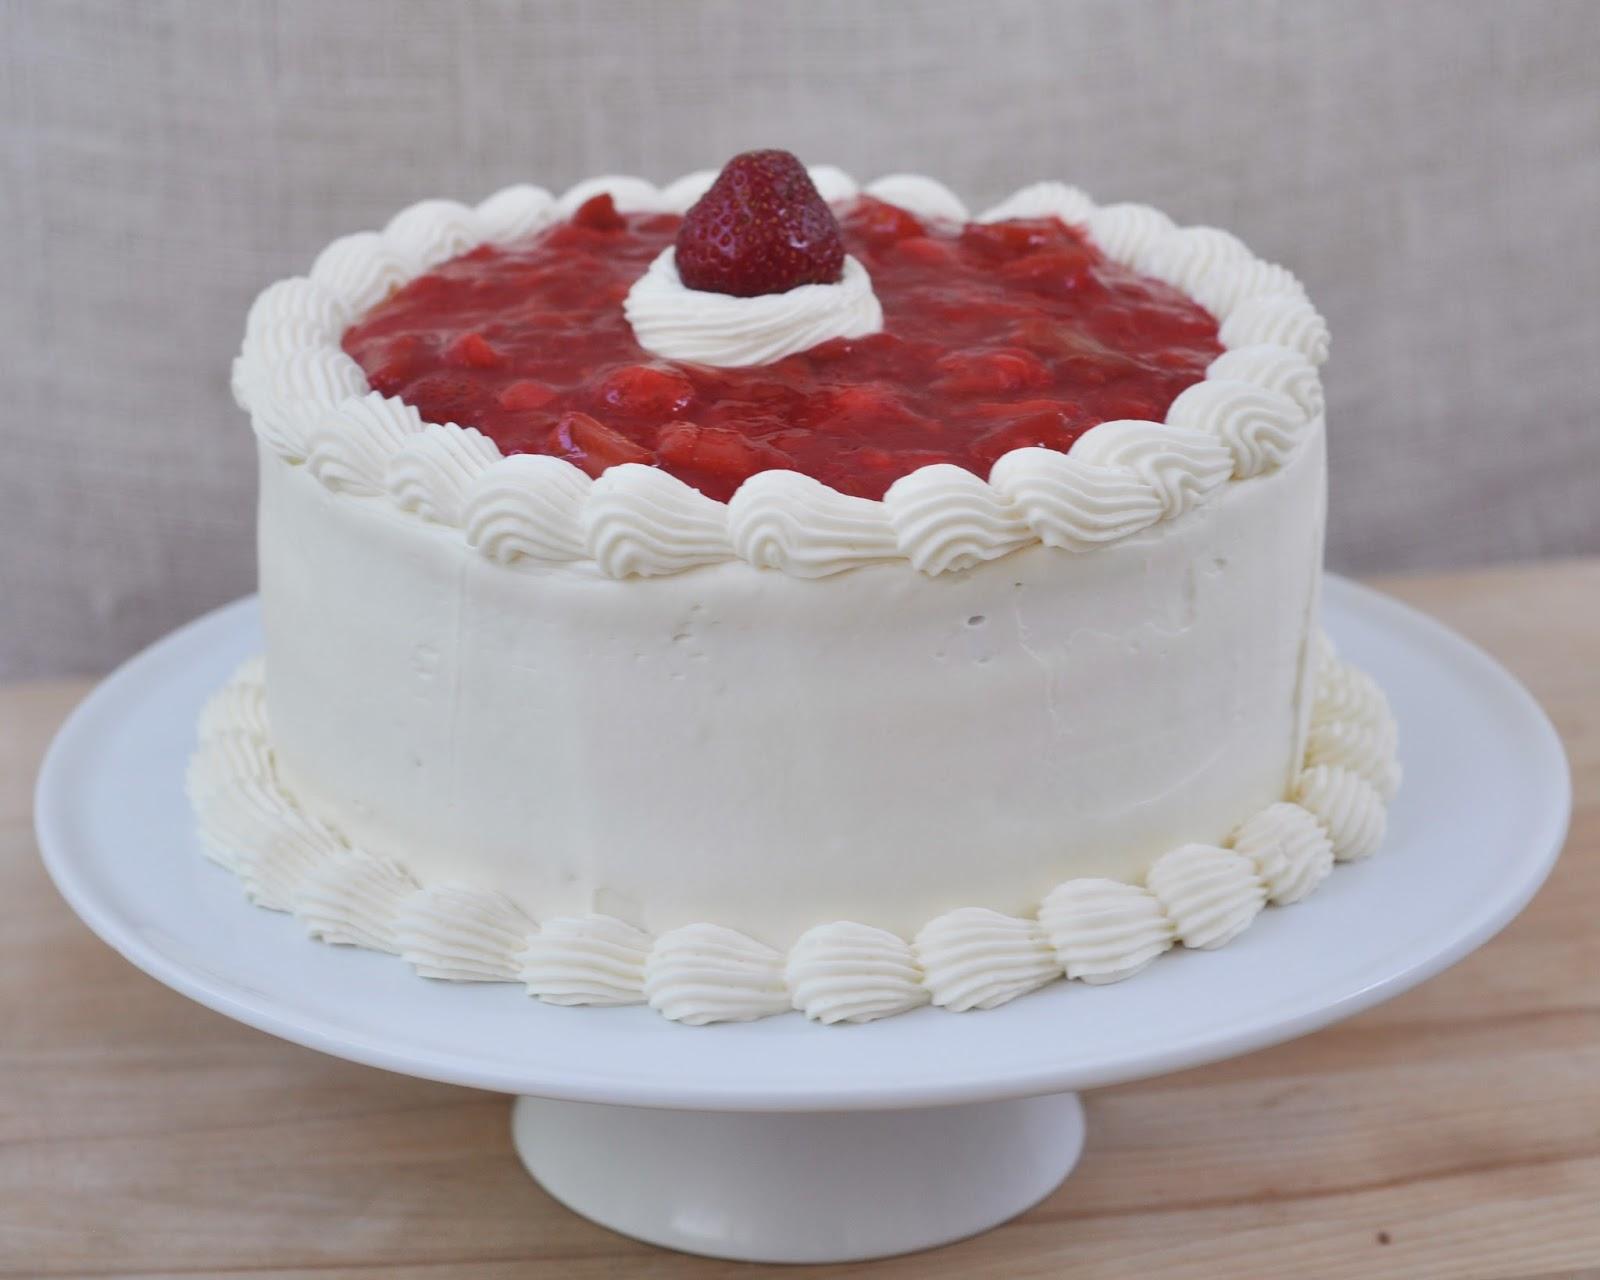 Beki Cooks Cake Blog Strawberry Rhubarb Cream Cake Recipe